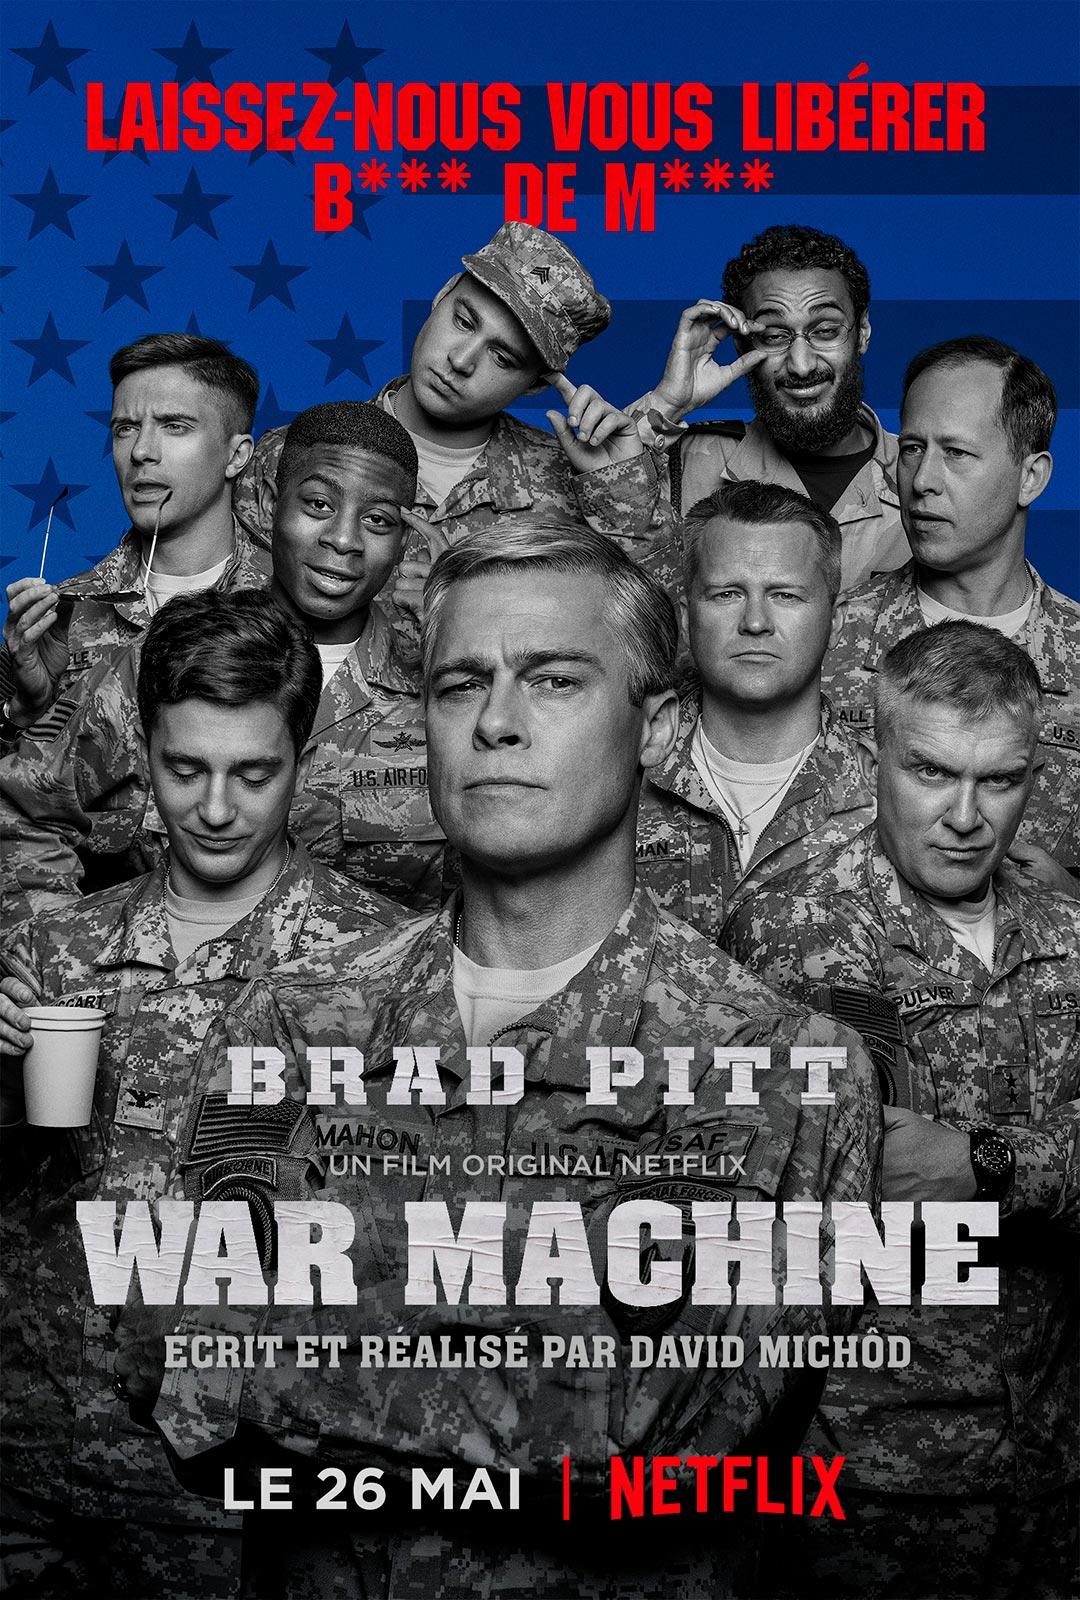 Critique : War Machine, de David Michôd (Netflix) - Critikat